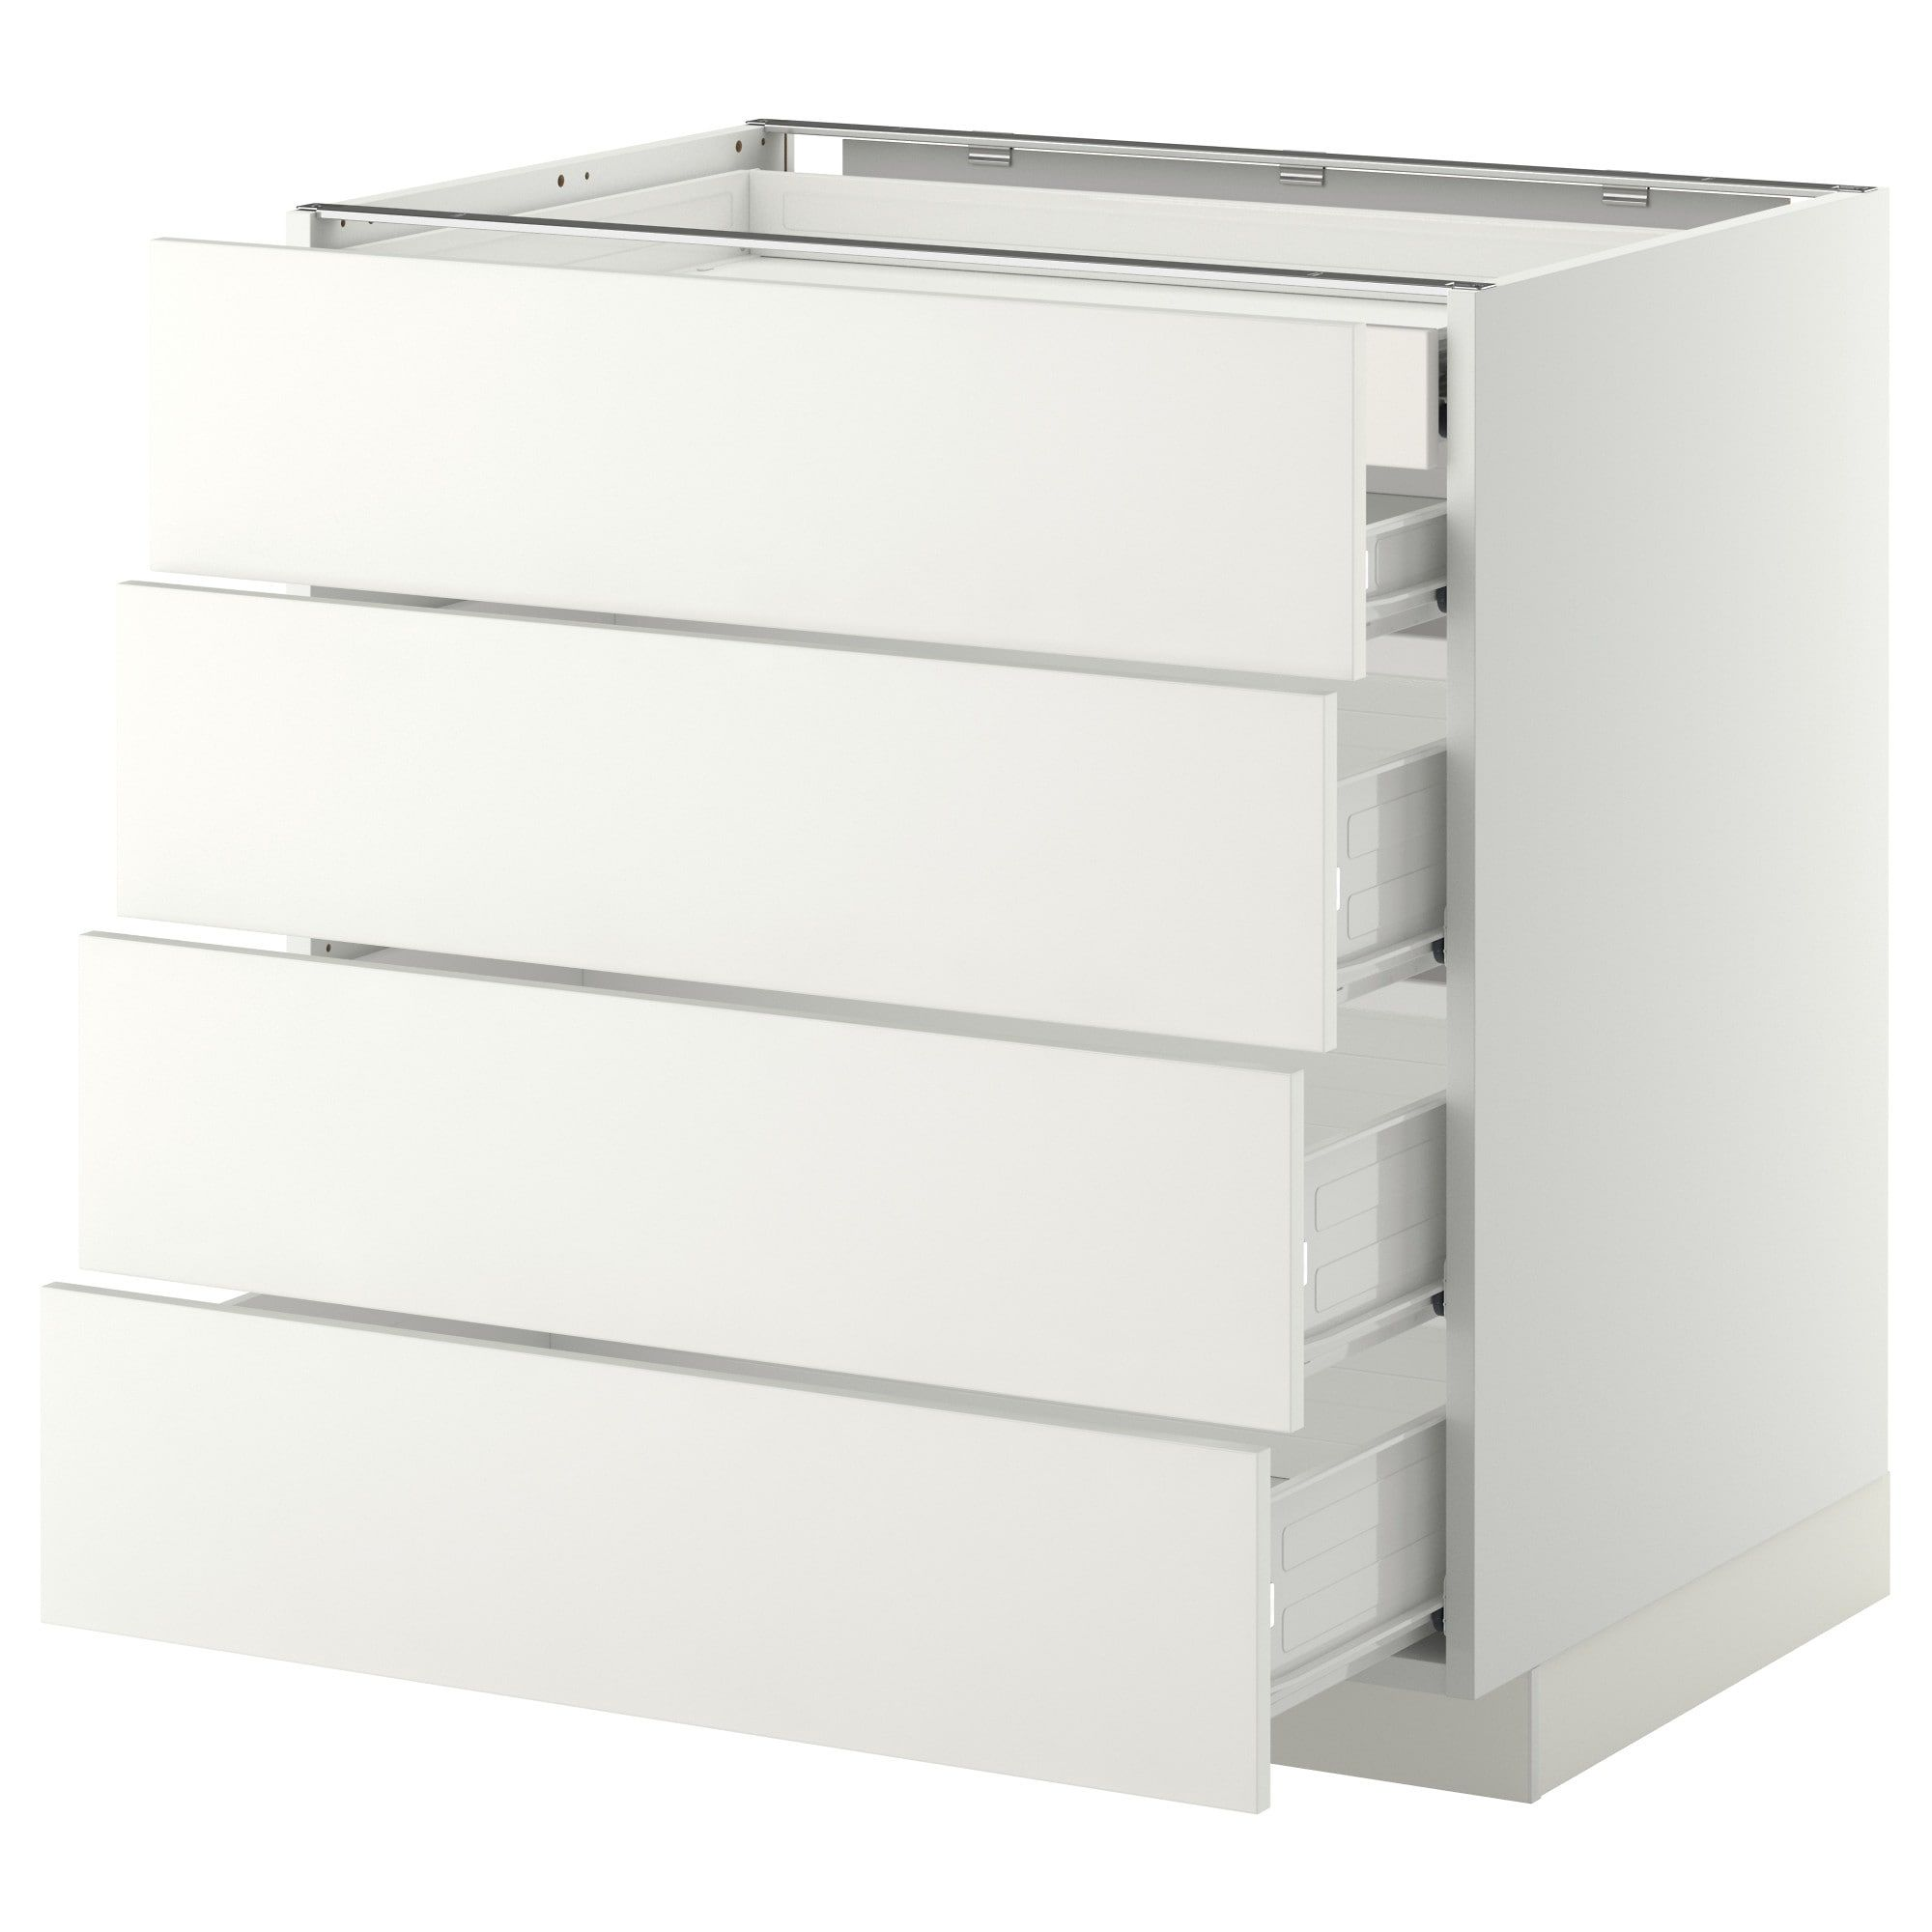 Metod Forvara Elt Bas 4faces 2tiroirs Bas 3moyens Blanc Haggeby Blanc 80x60 Cm Ikea En 2020 Meuble Bas Meuble Bas Cuisine Mobilier De Salon